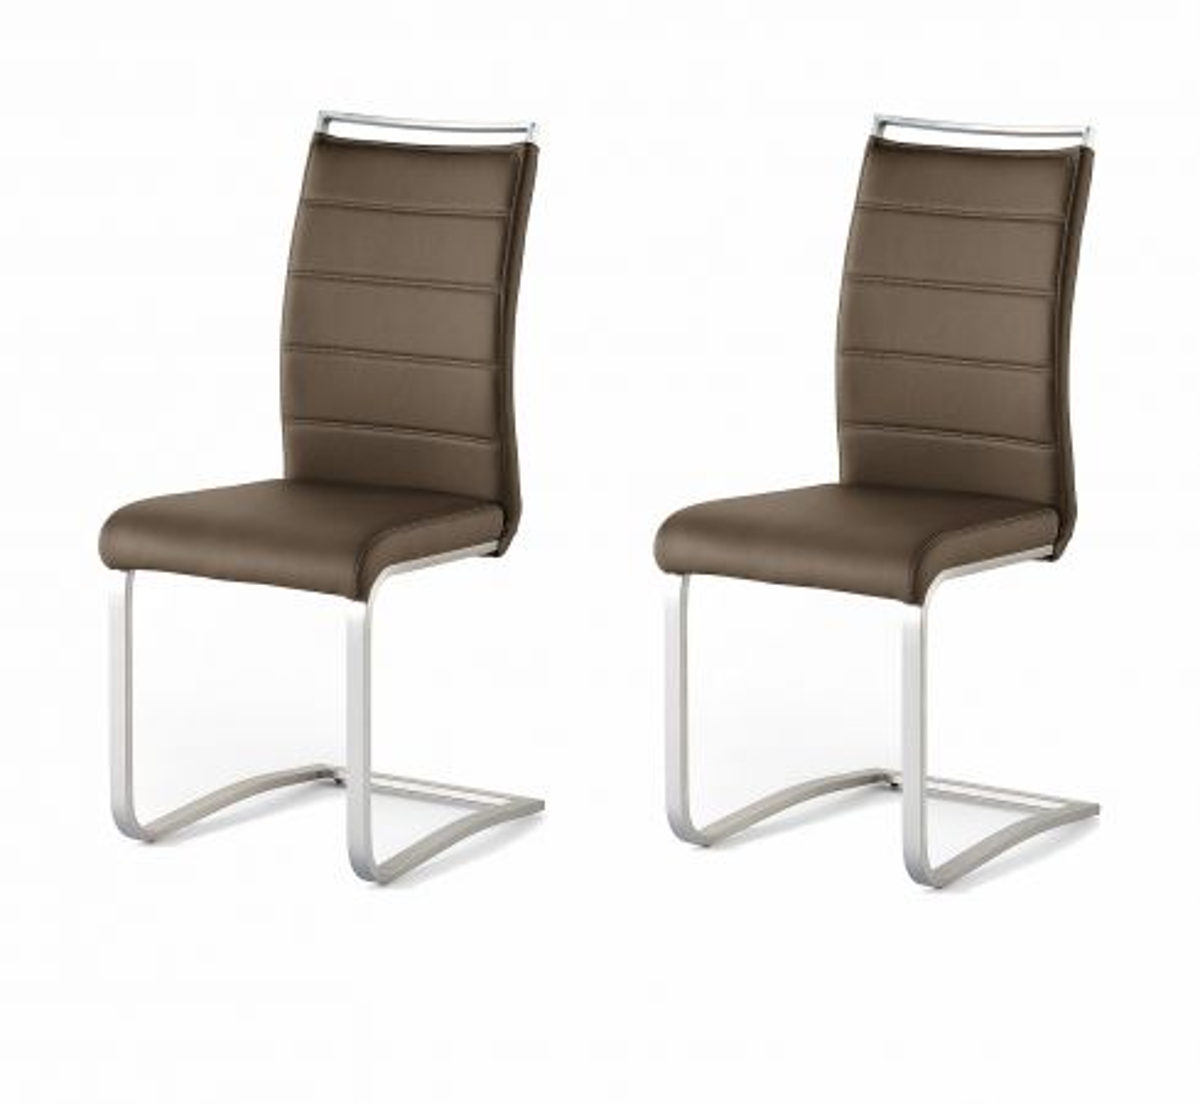 2 x Stuhl Pescara Braun Schwinger Kunstleder